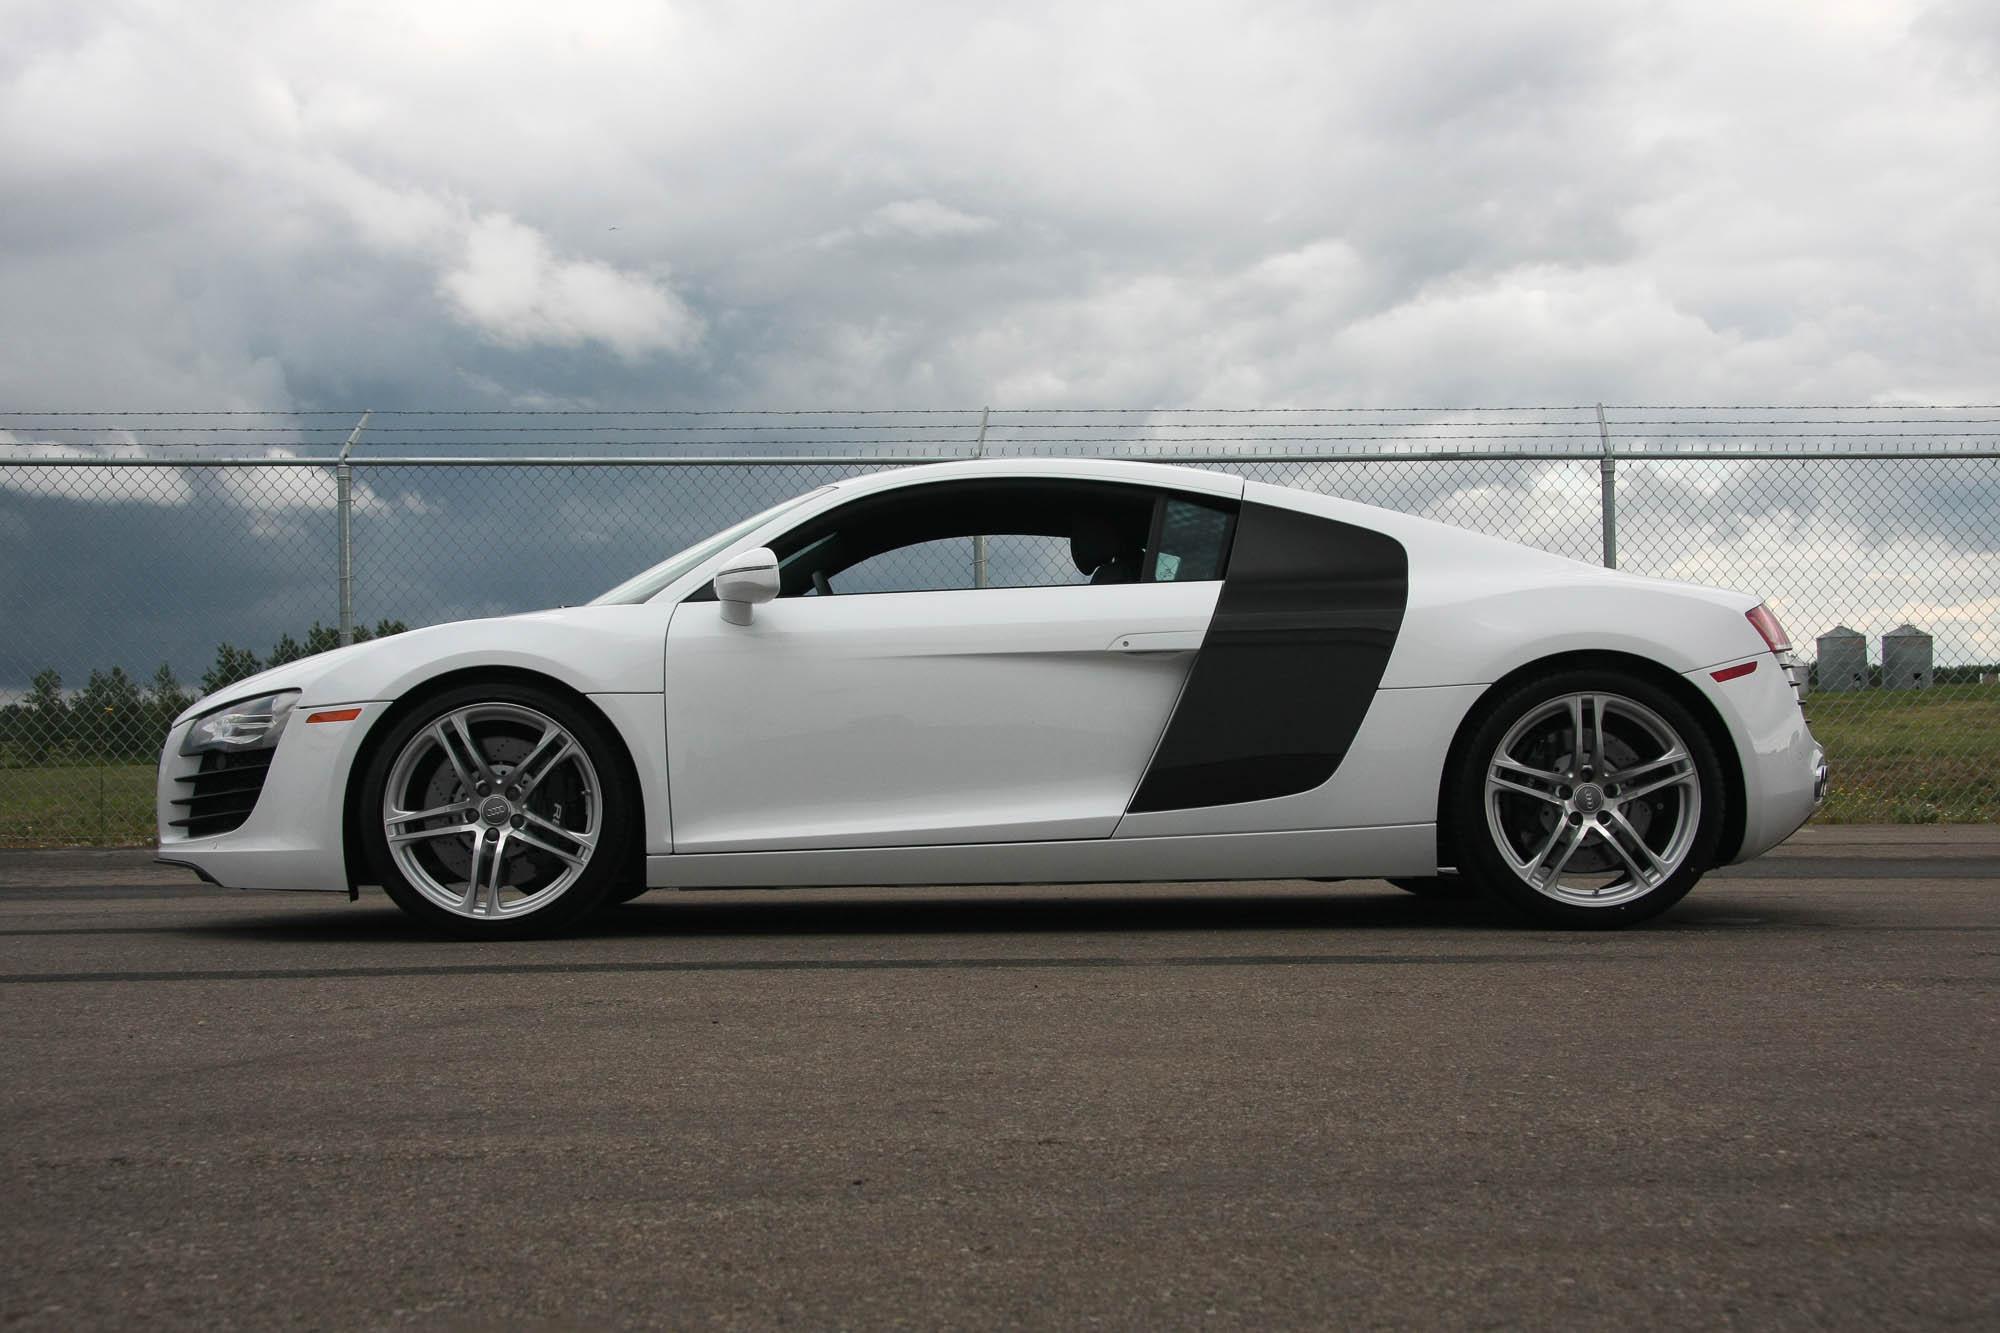 2009 Audi R8 Sold The Iron Garage